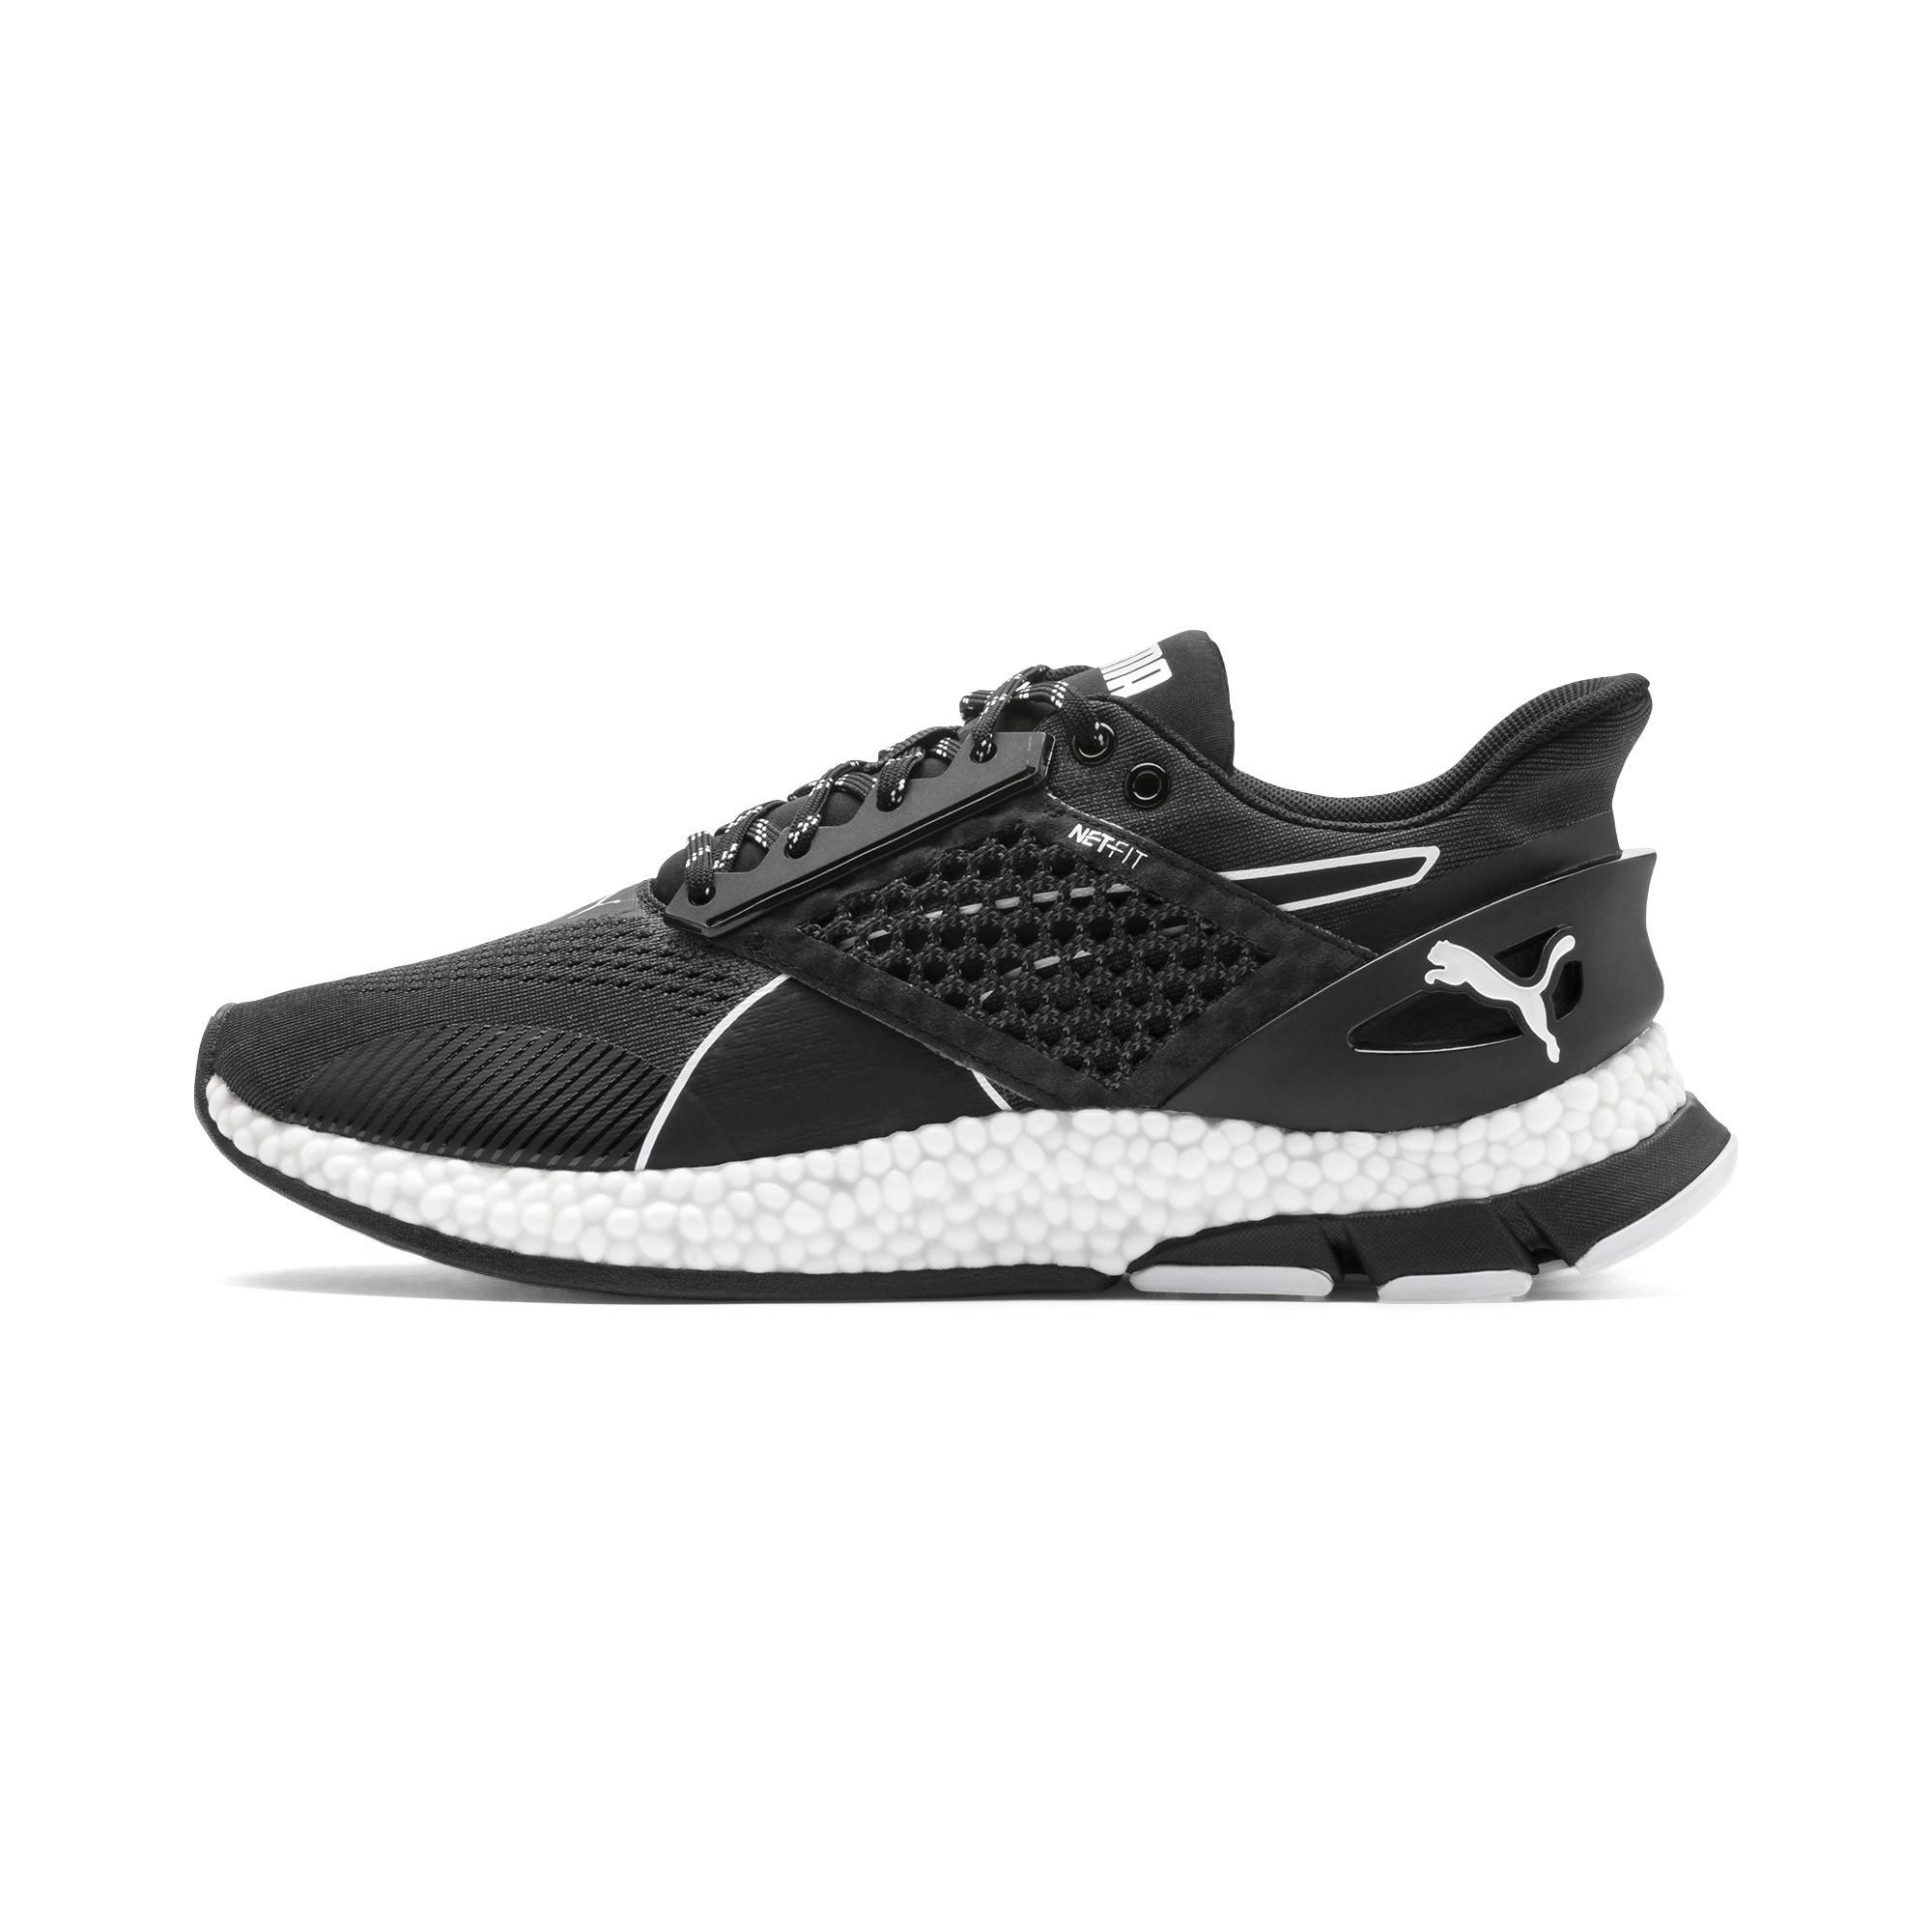 Laufschuh 'Astro' | Schuhe > Sportschuhe | Puma